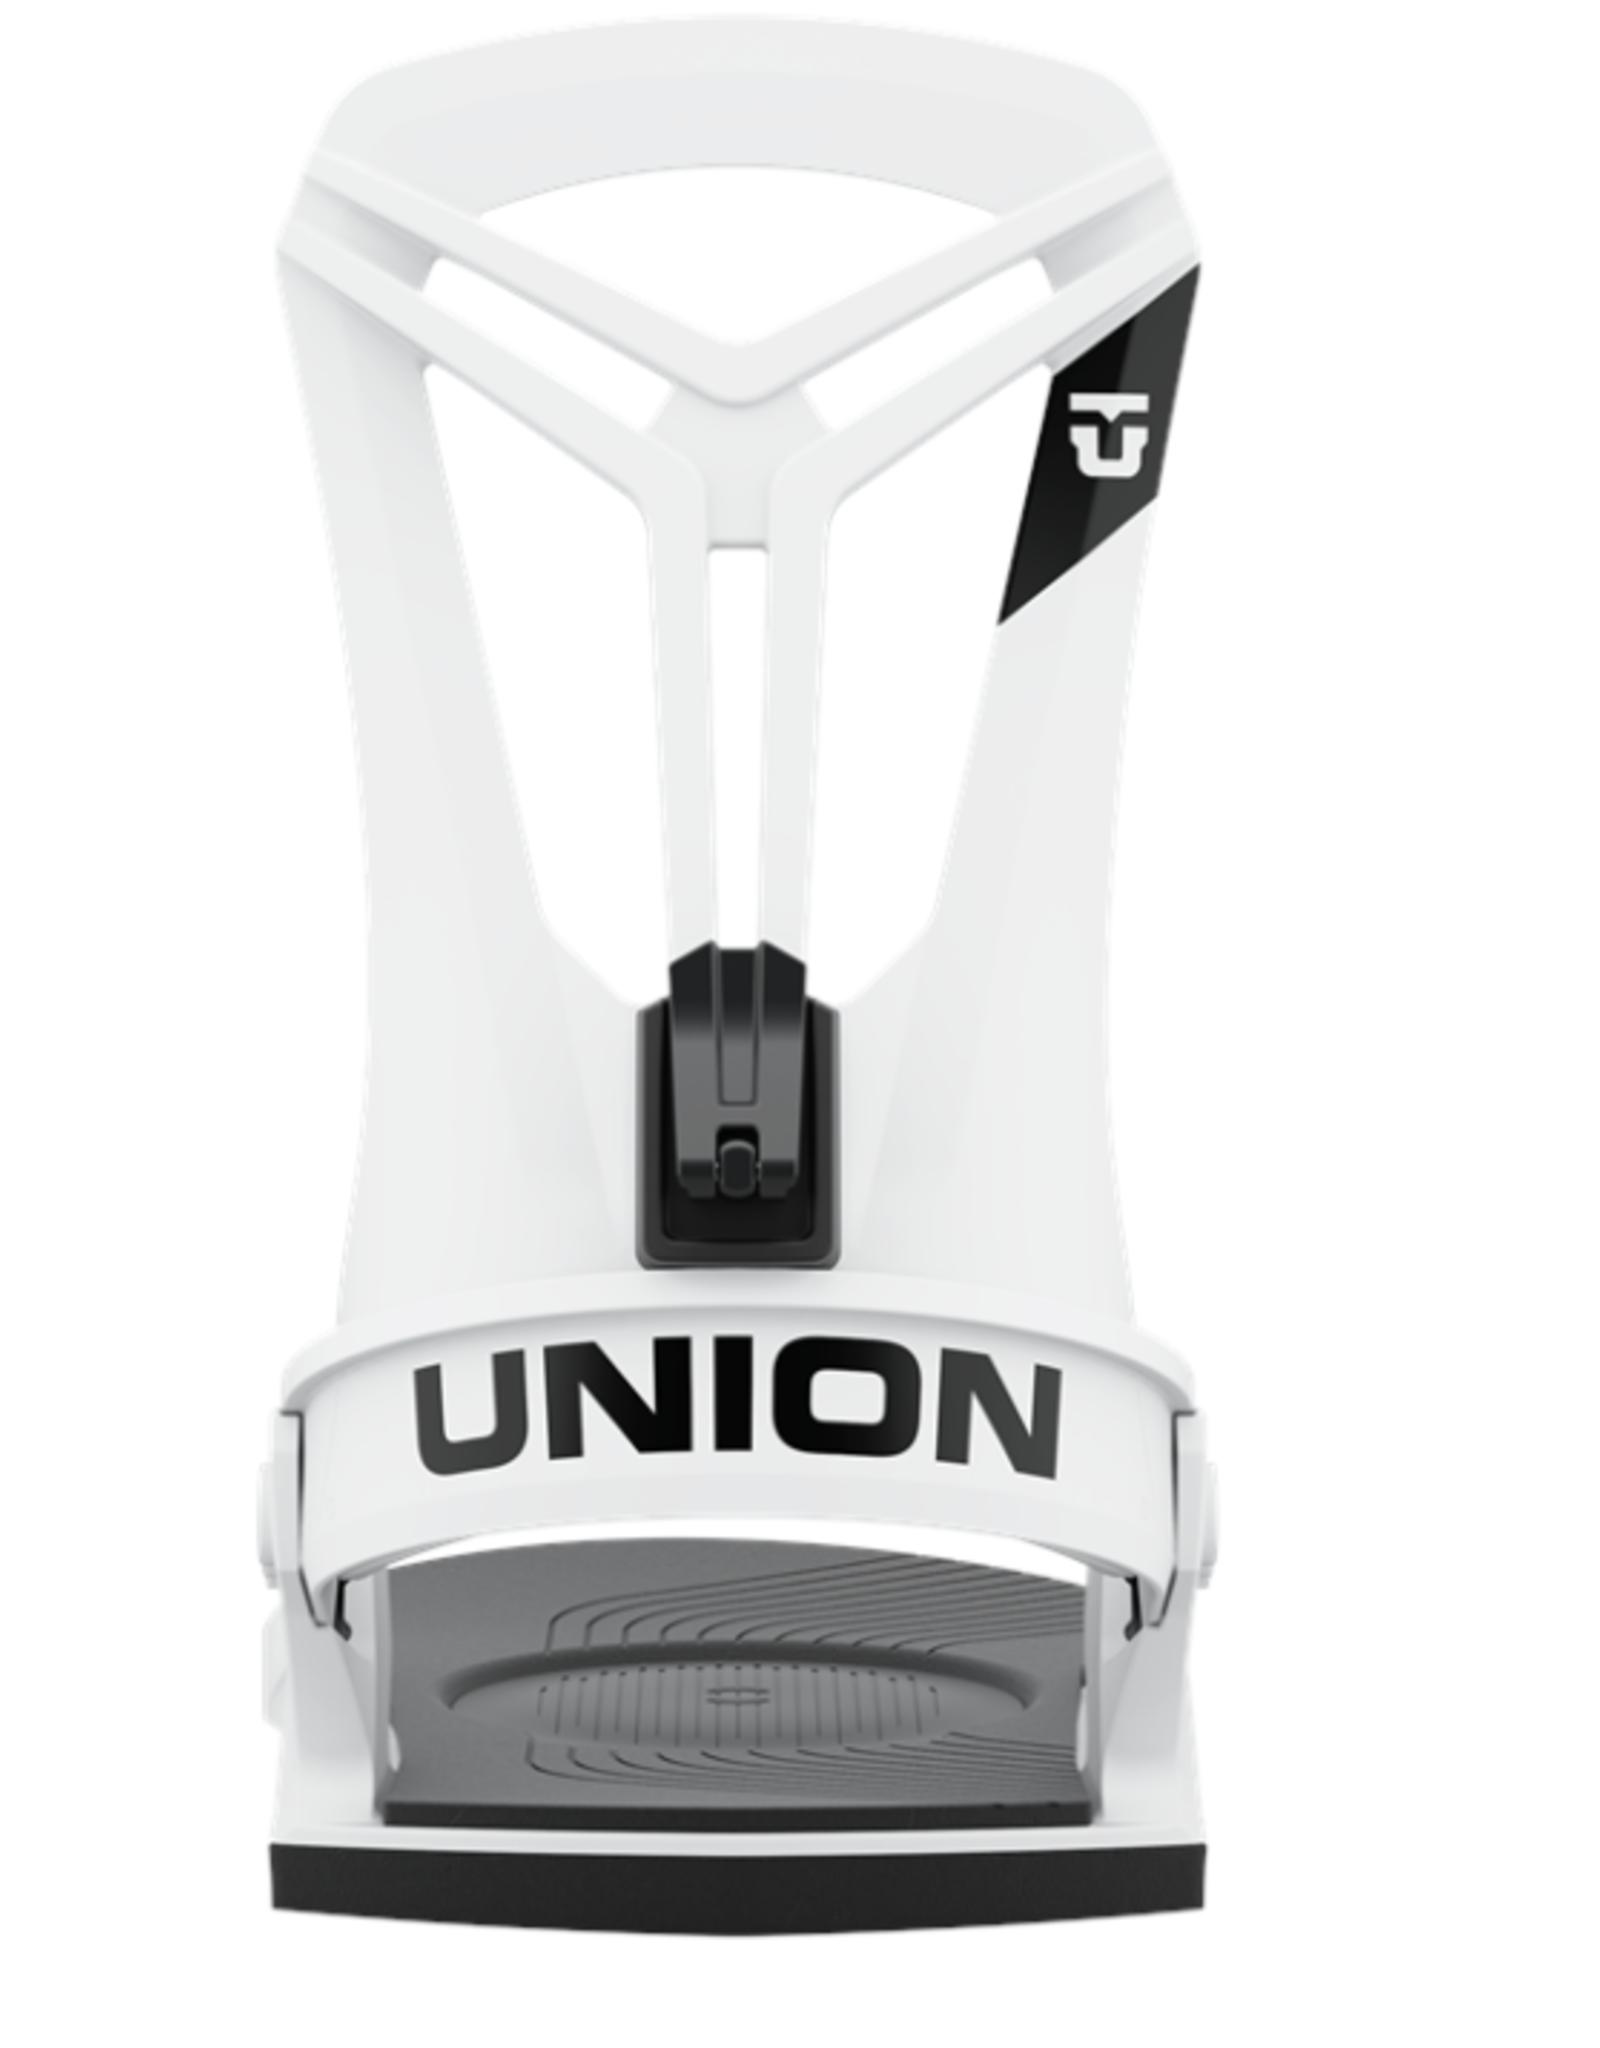 UNION Union Men's Flite Pro Bindings White 2022